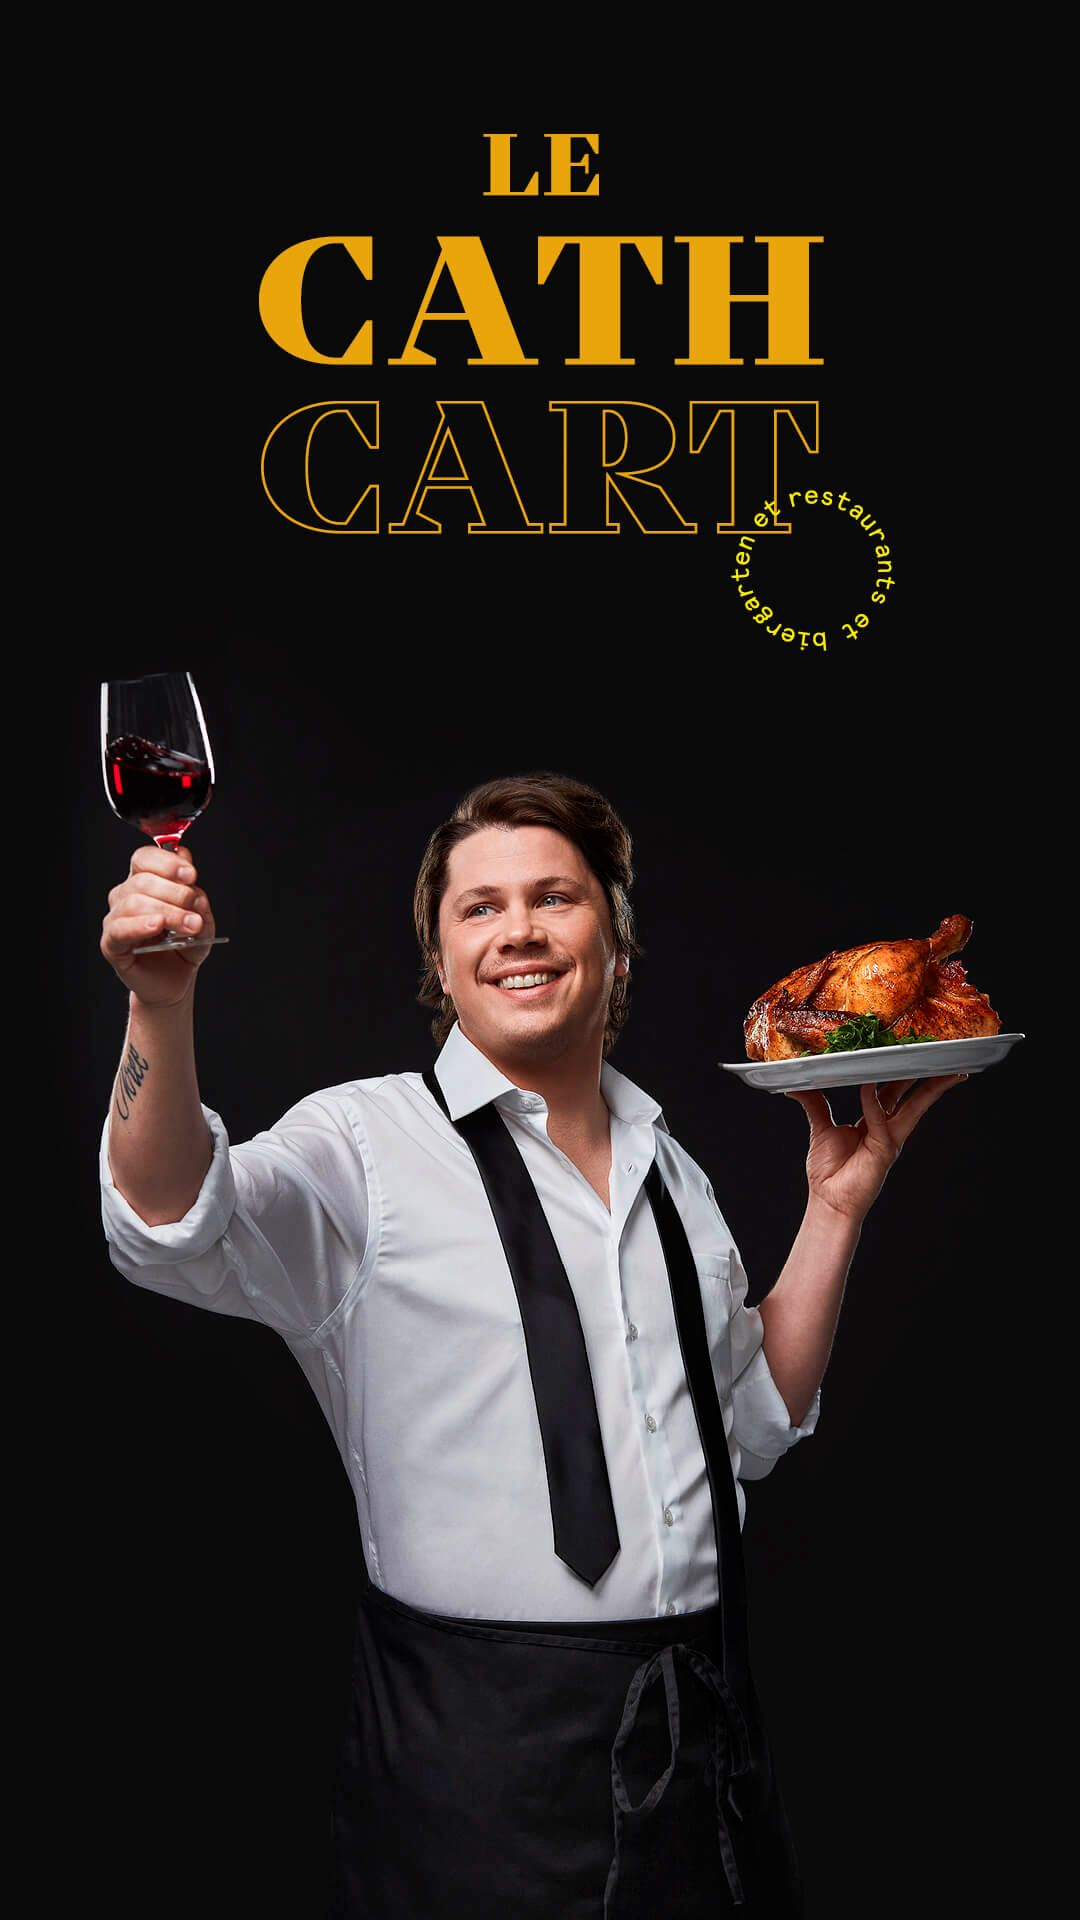 Nicholas Giambattisto by Jocelyn Michel for Cathcart restaurant